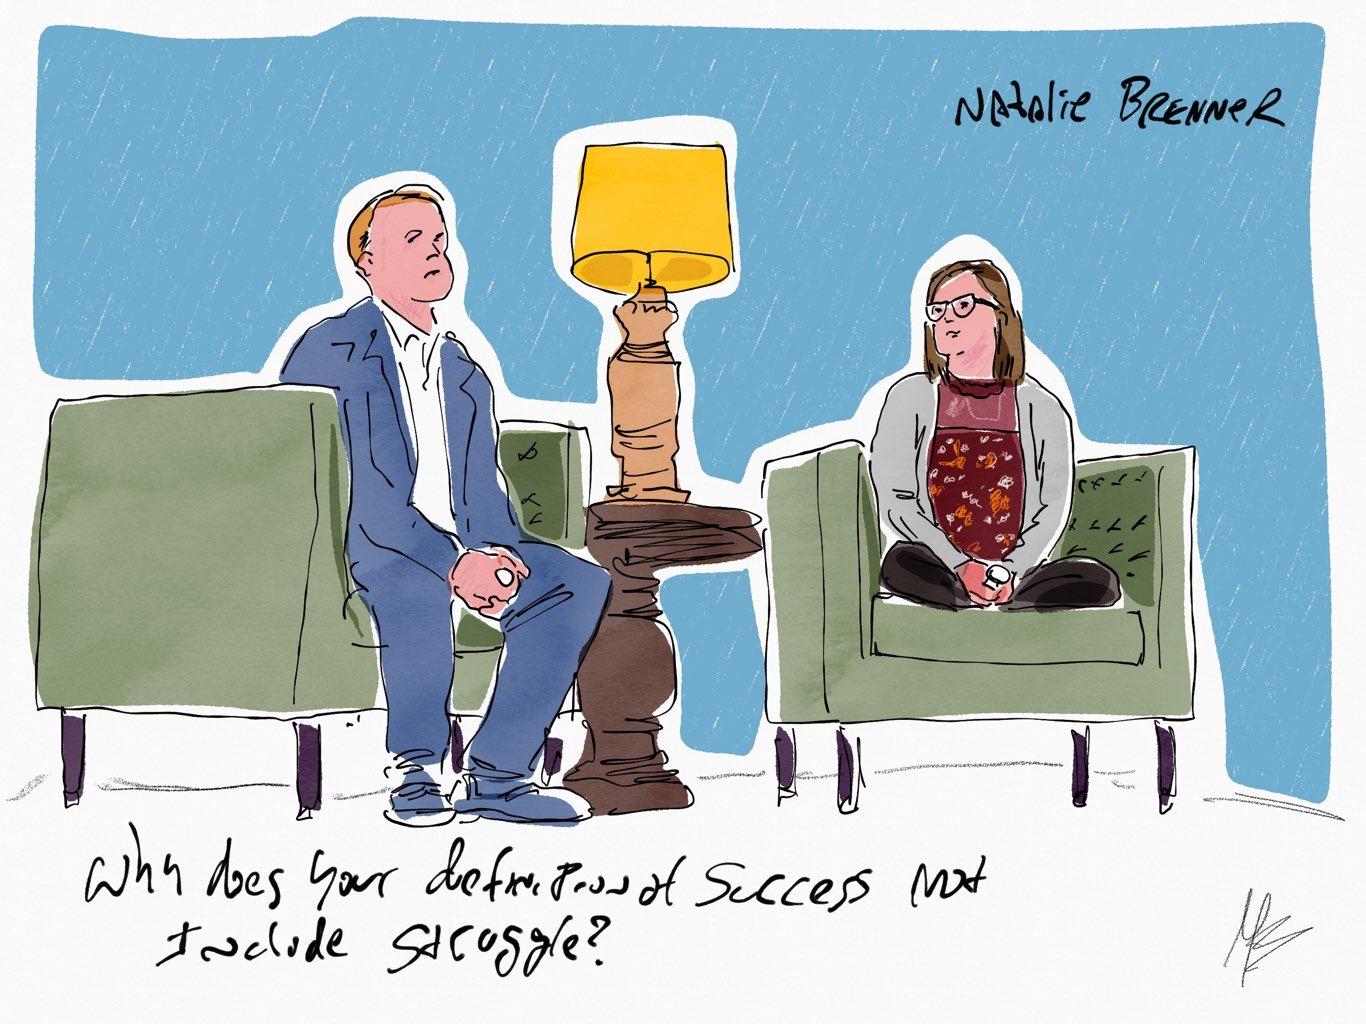 Live Sketch during Jeff's interview of Natalie Brenner.